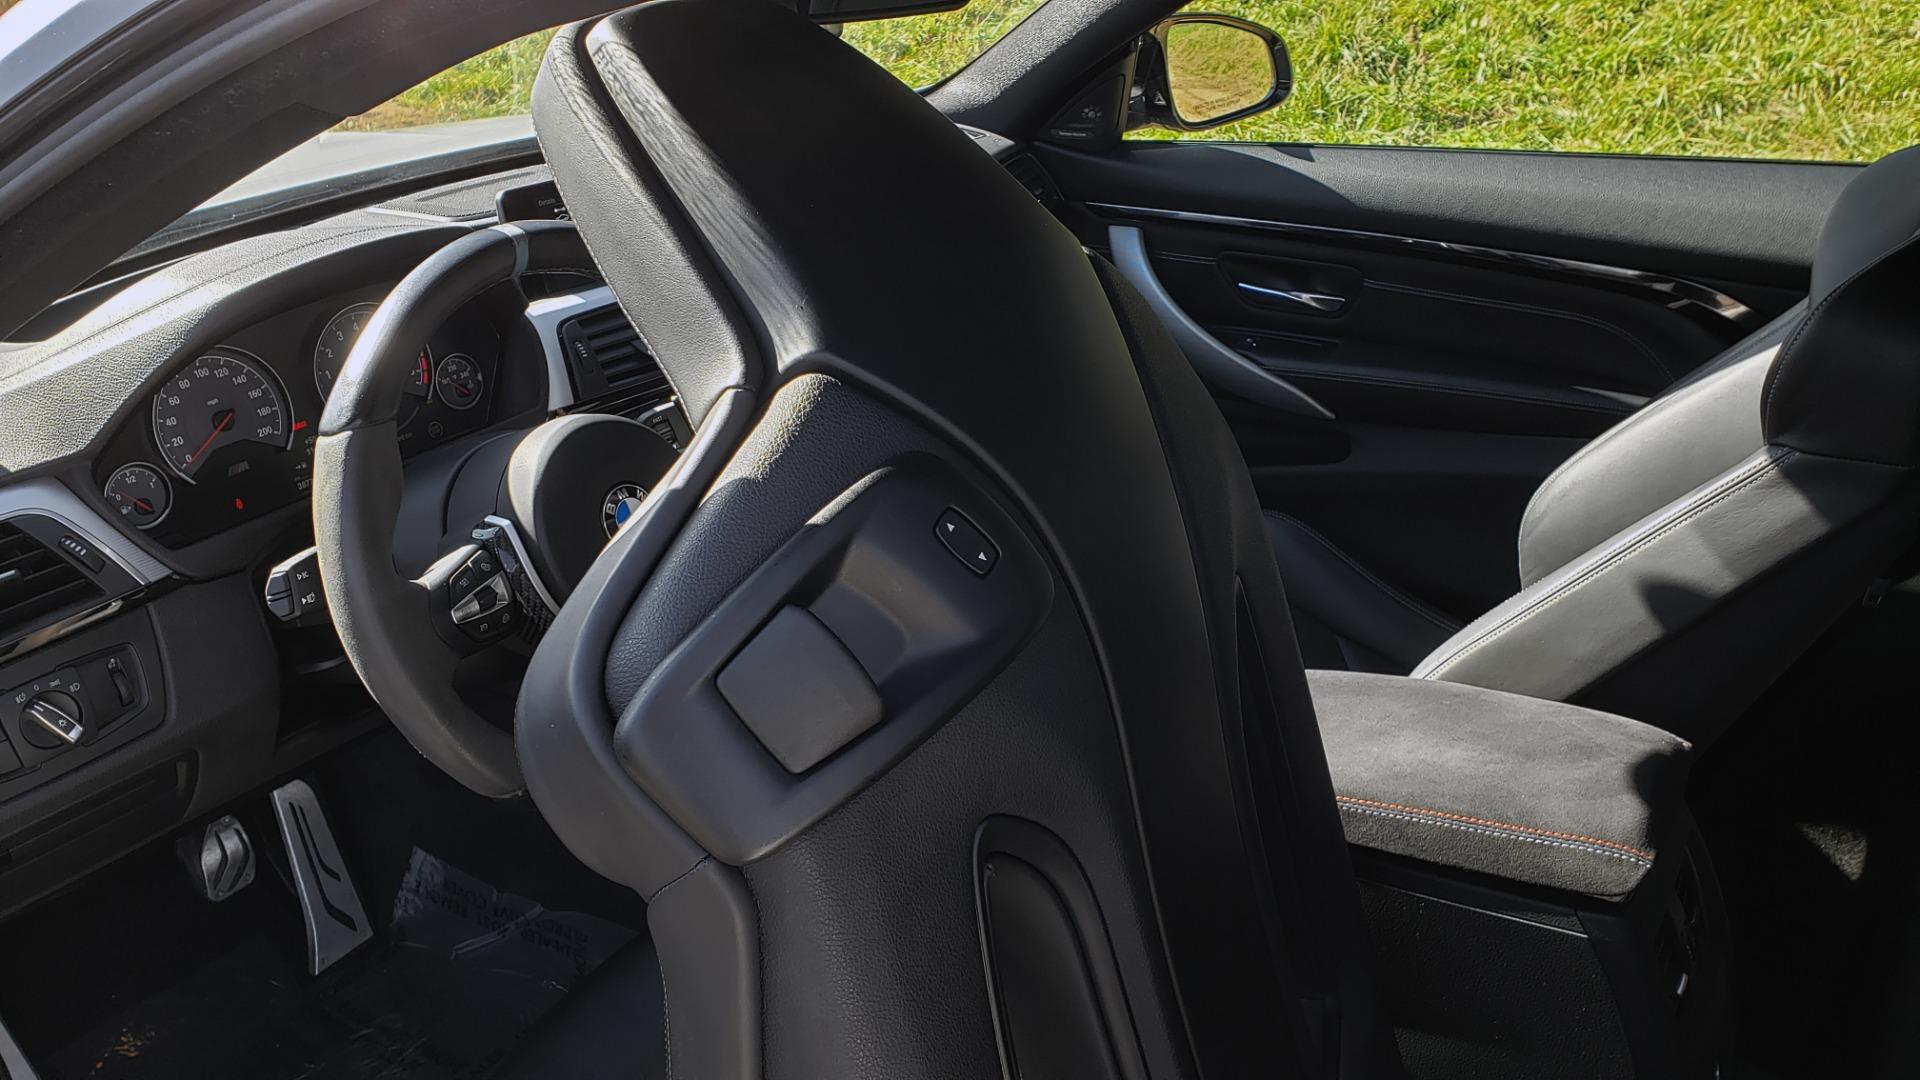 Used 2018 BMW M4 COMP PKG / EXEC / M-DRIVER / PARK CNTRL / ACTIVE BLIND SPOT for sale Sold at Formula Imports in Charlotte NC 28227 60